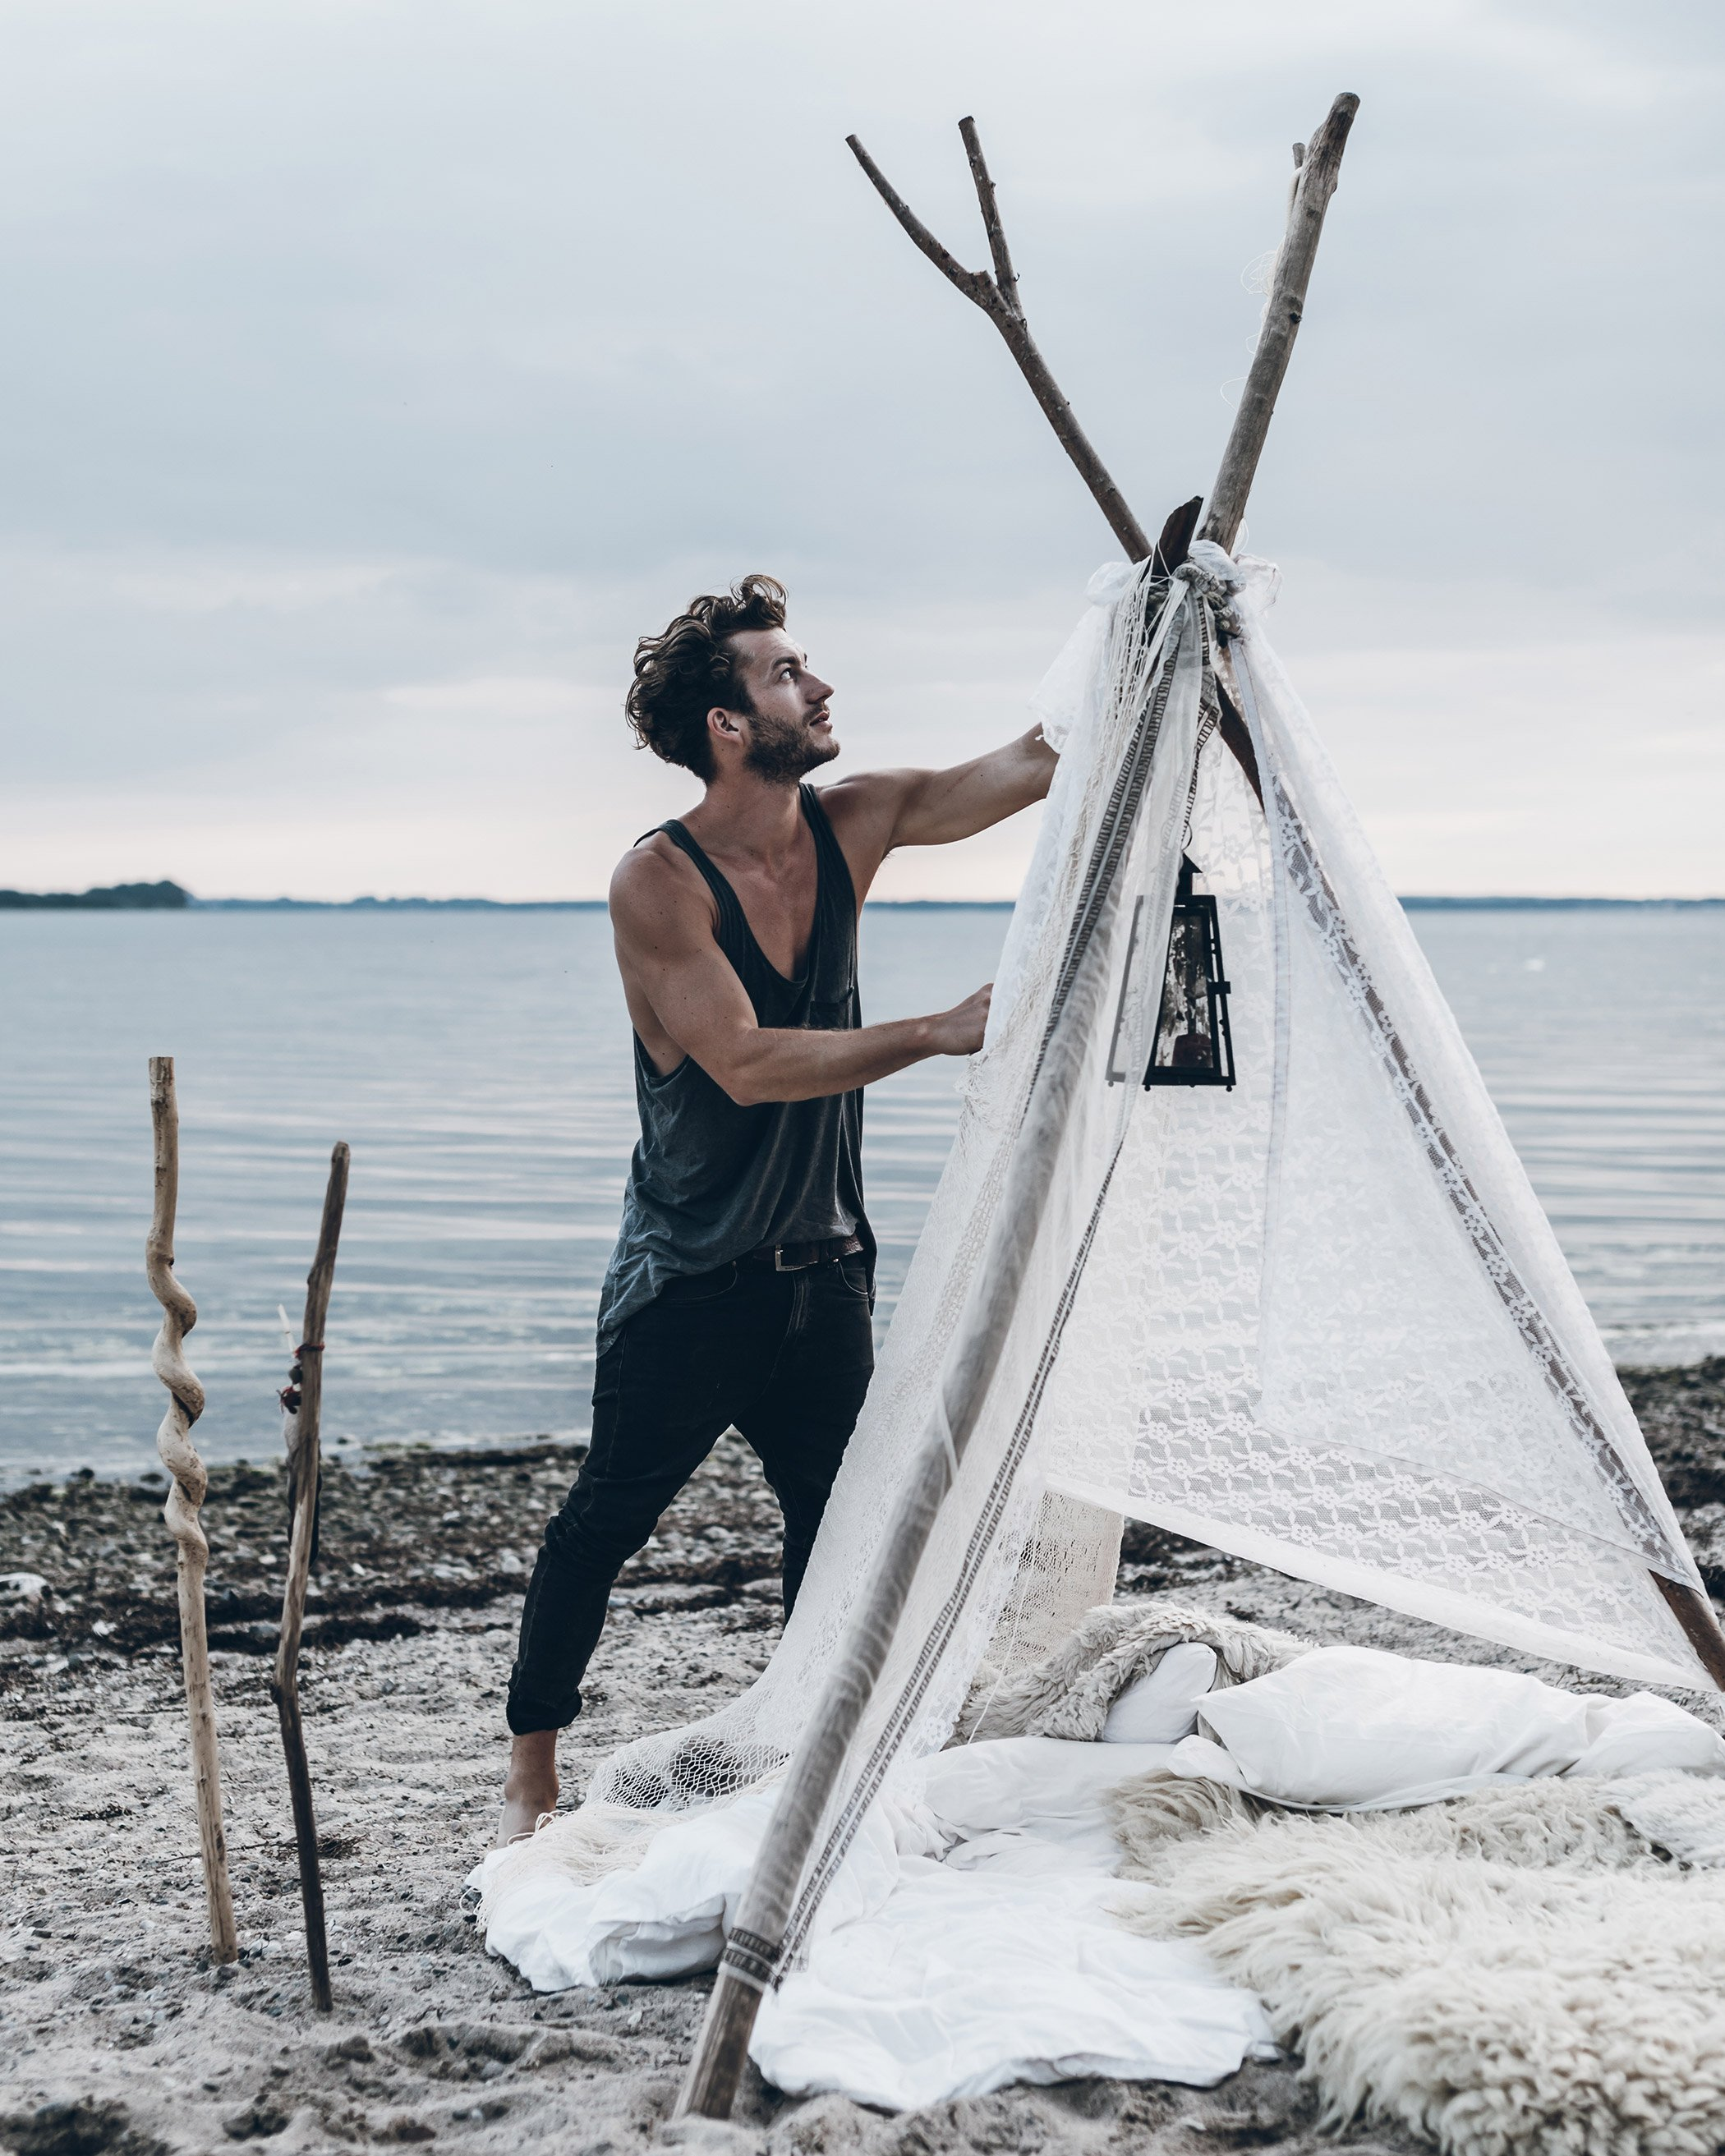 mikuta-cozy-beach-tent-15